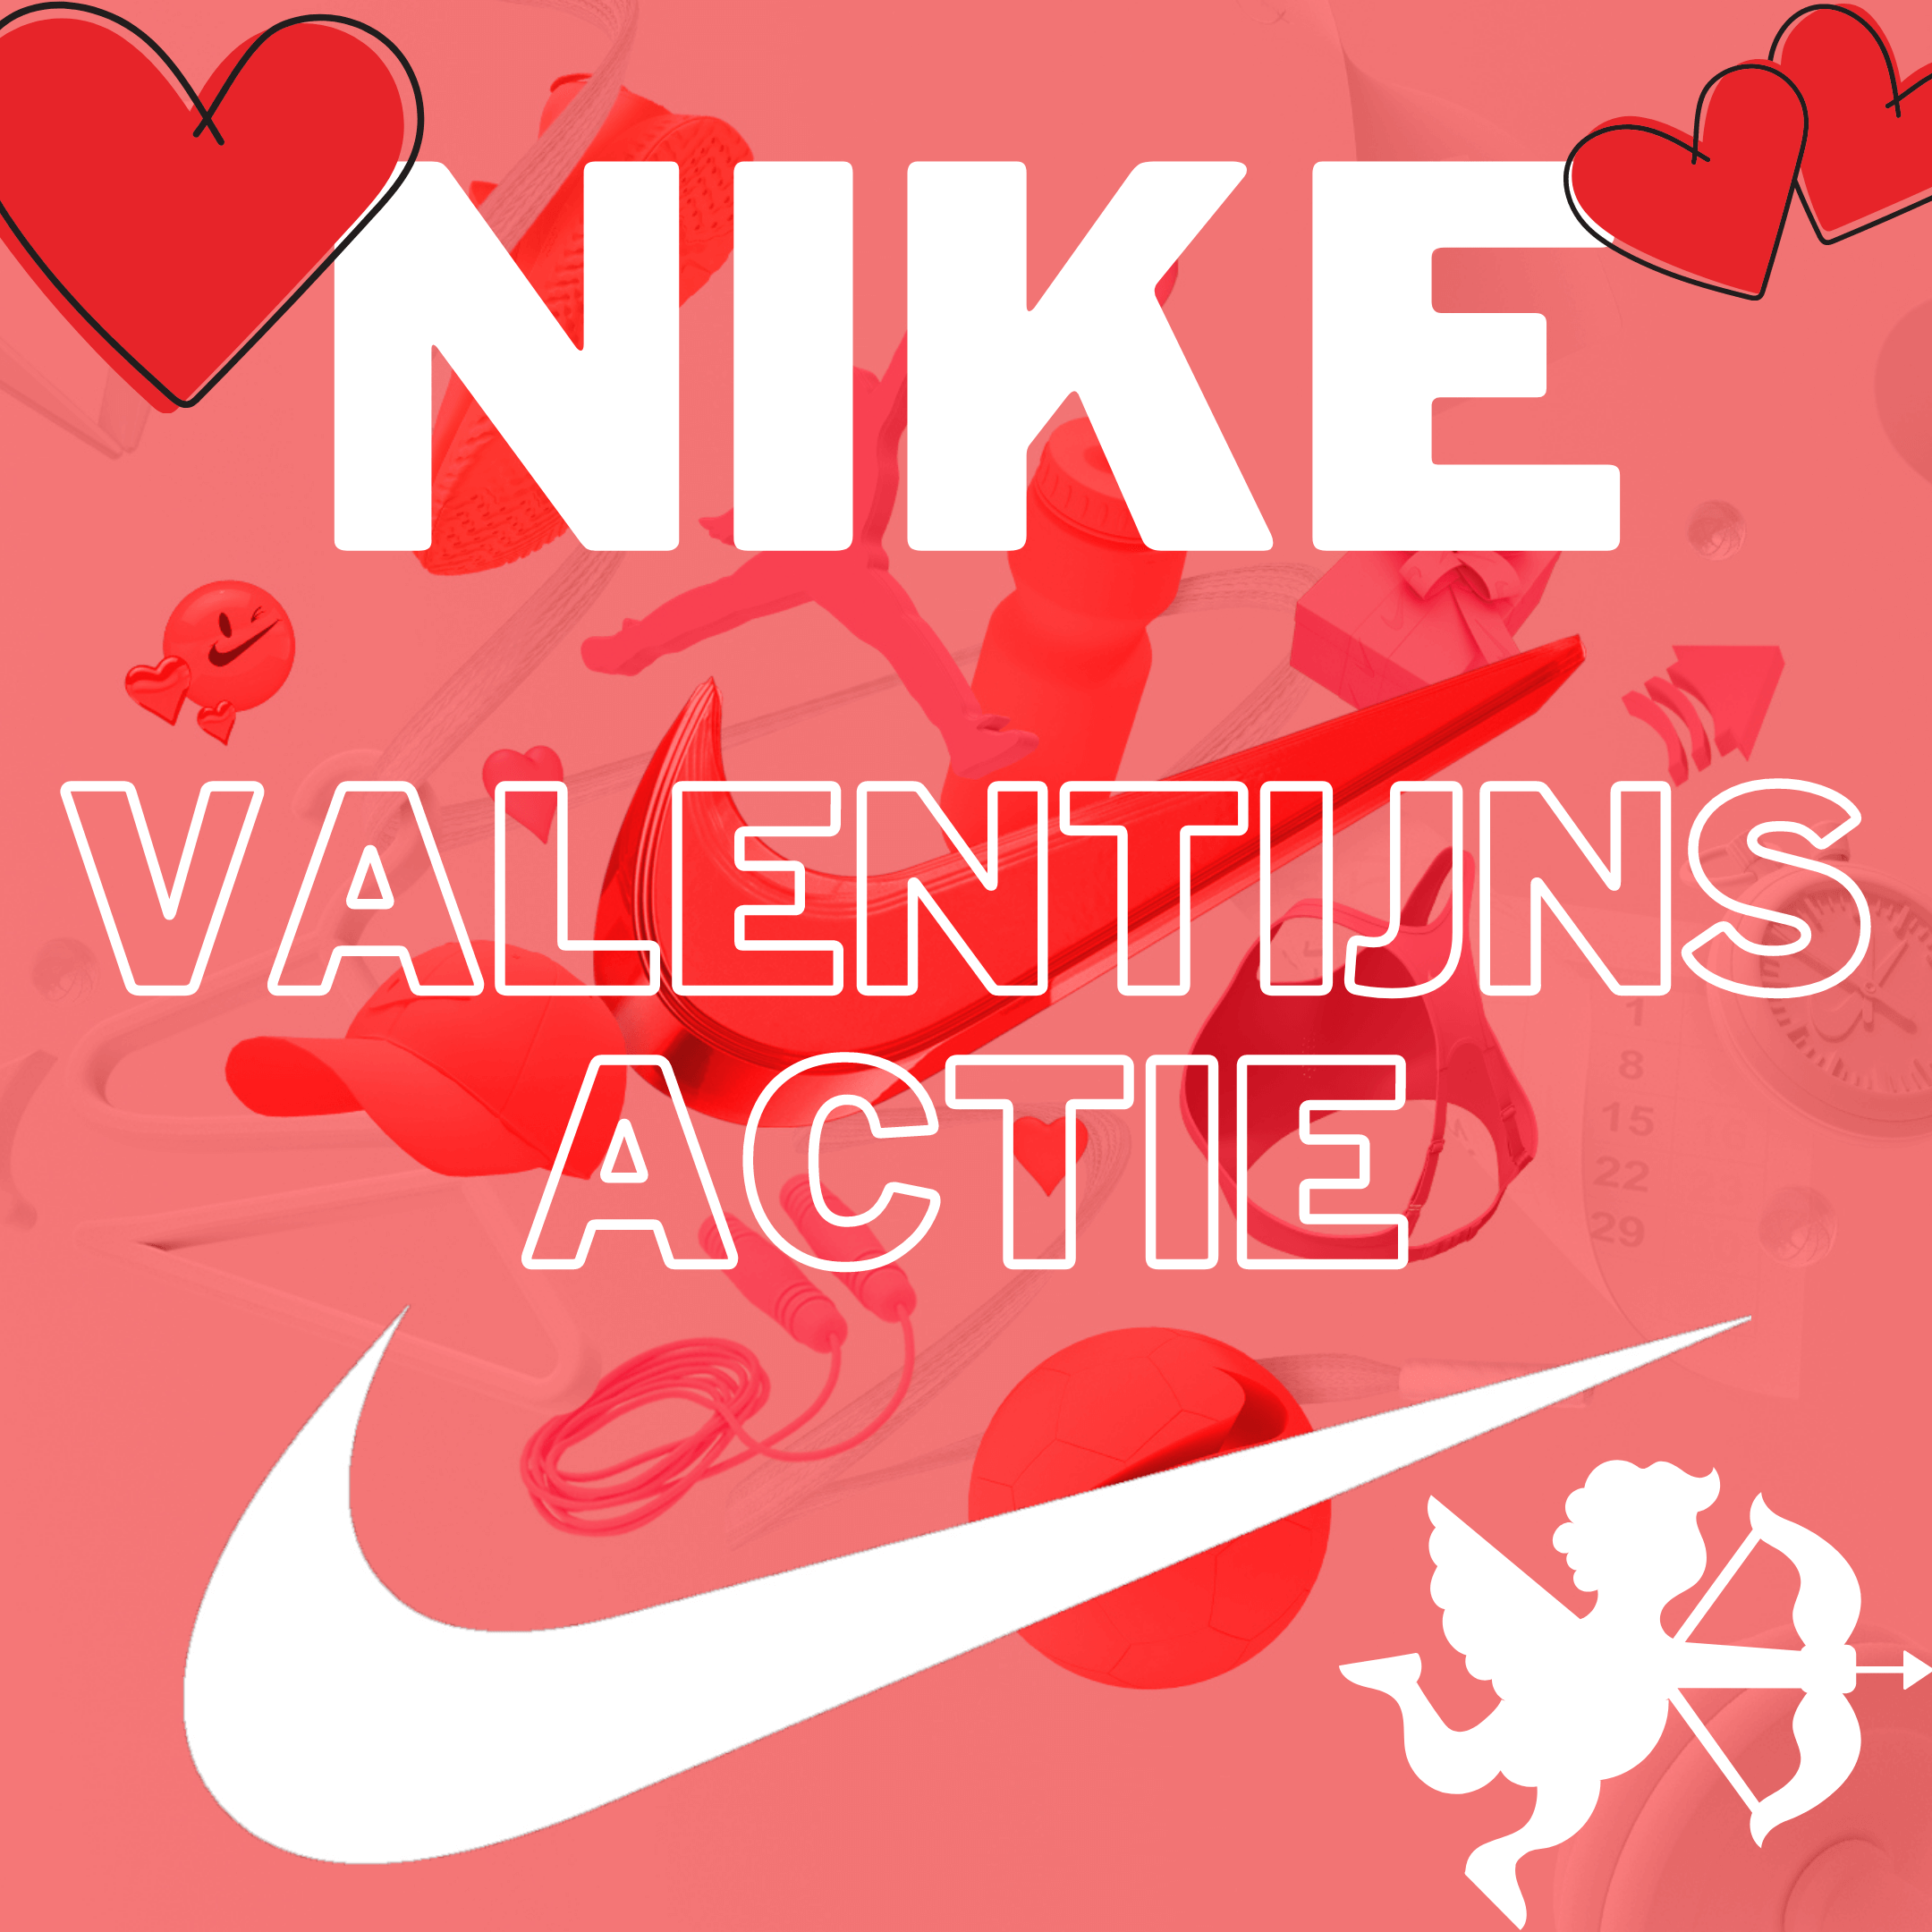 Nike Valentijnsactie/sale - 20% korting op full price items